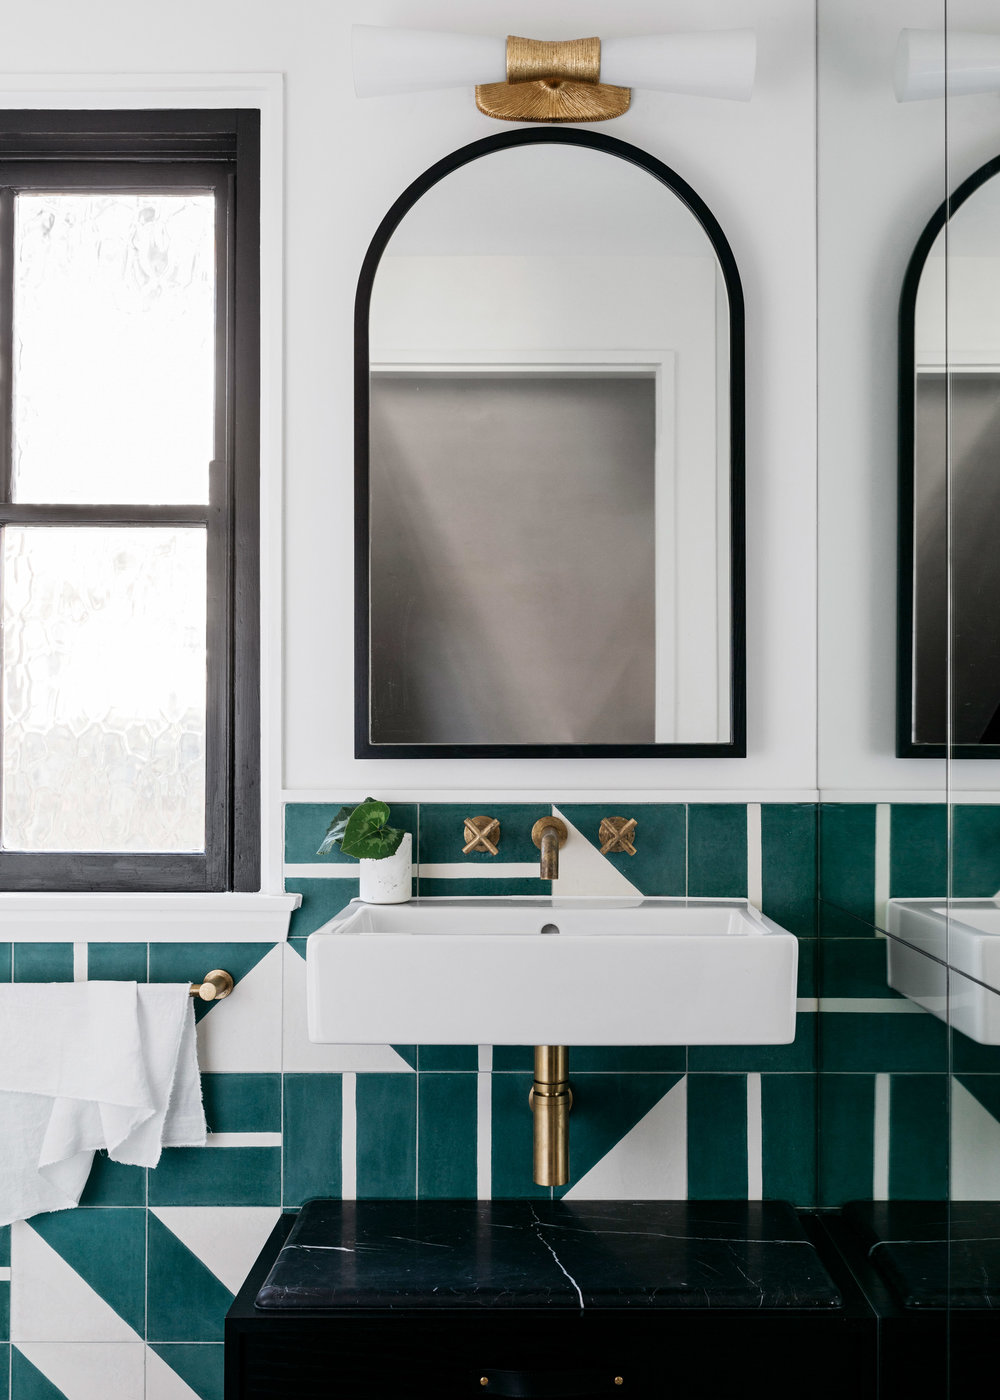 curatorial-house-arent-pyke-interiors-residential-australia-sydney_dezeen_2364_col_0.jpg